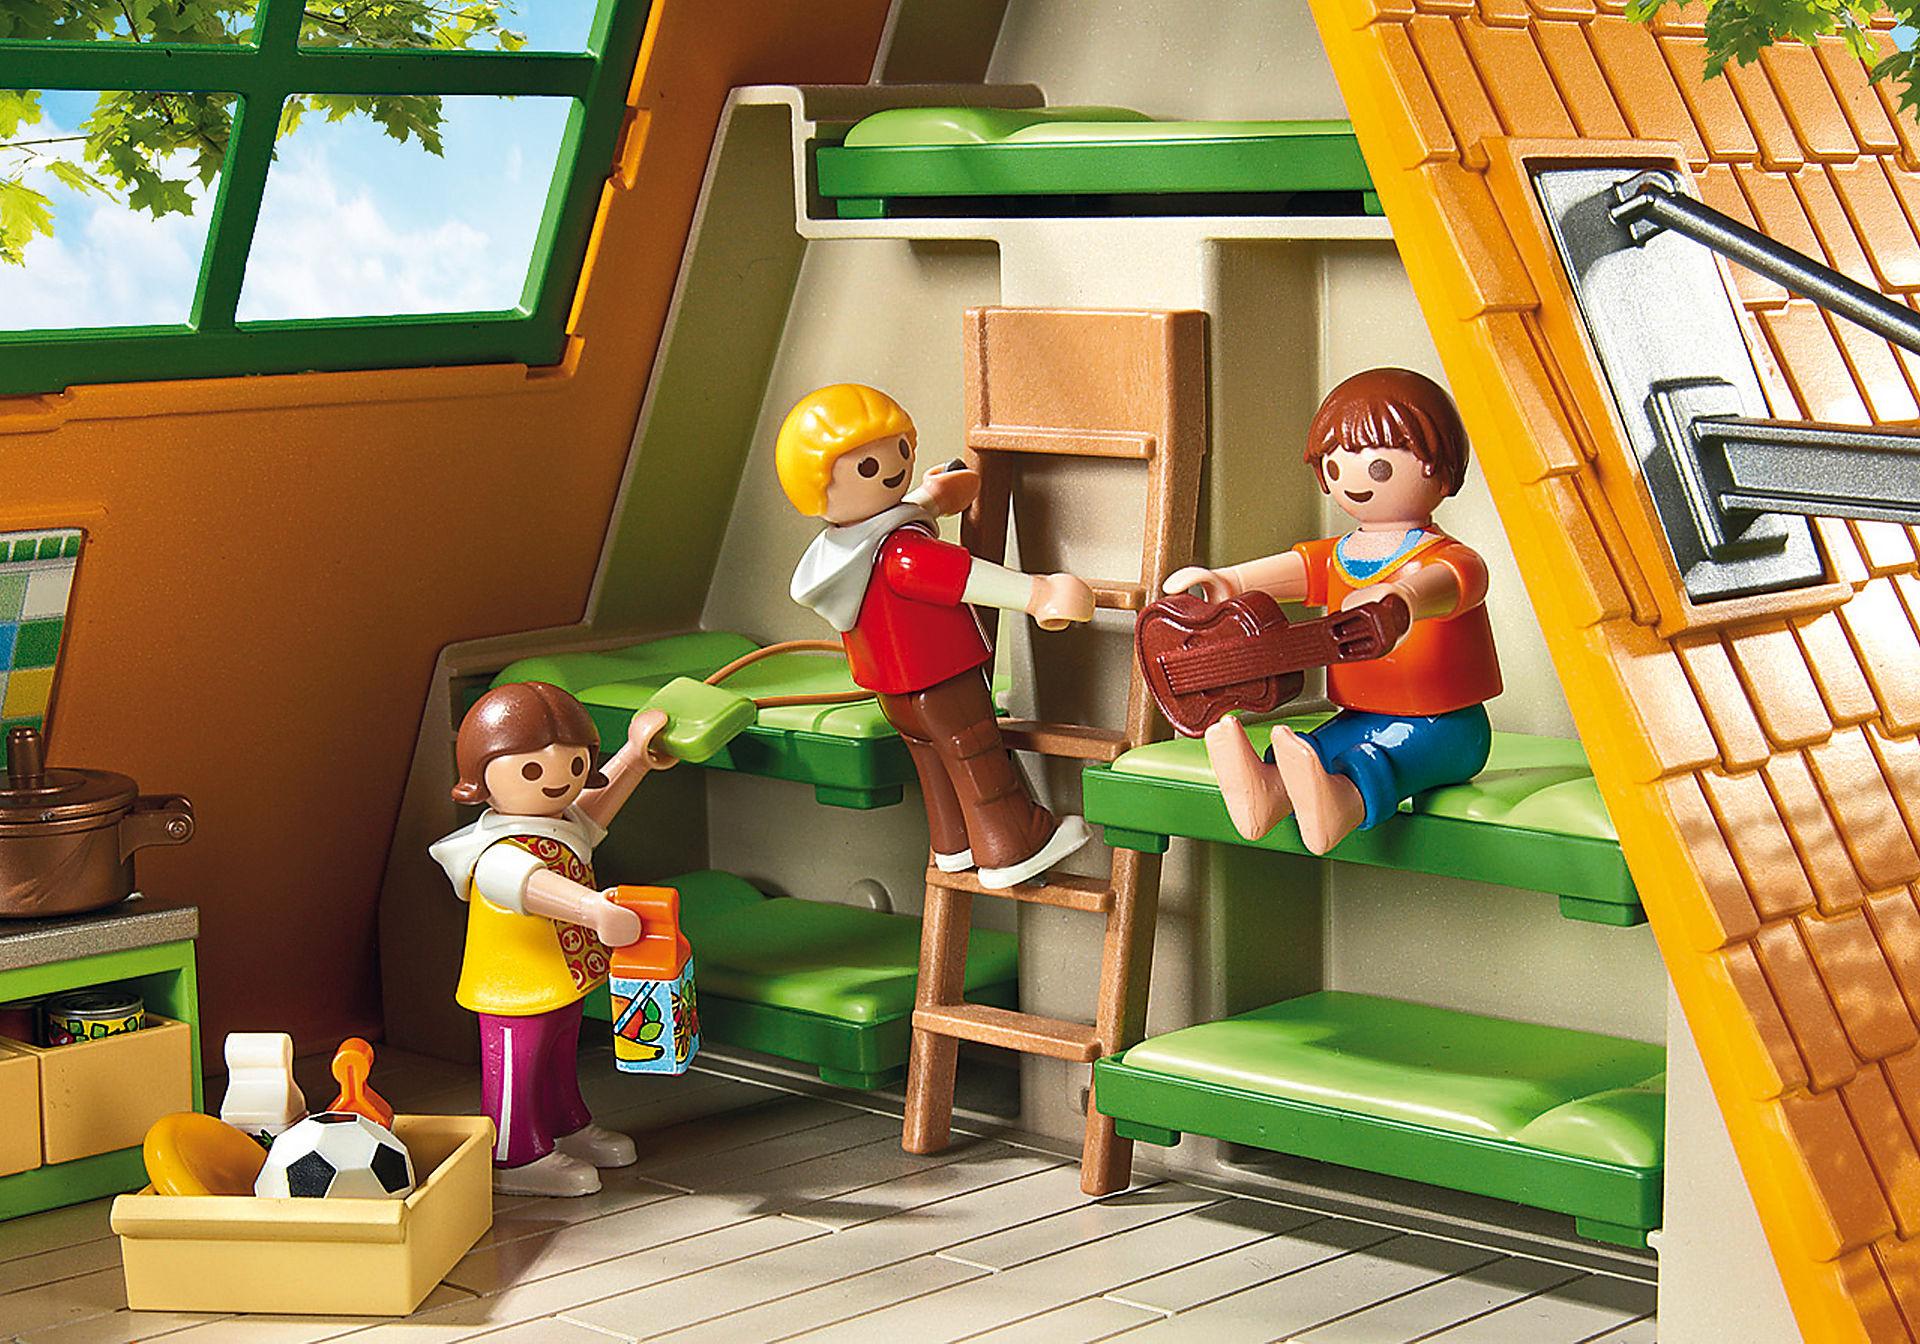 http://media.playmobil.com/i/playmobil/6887_product_extra2/Casa vacanze con area giochi e tavoli da pic-nic